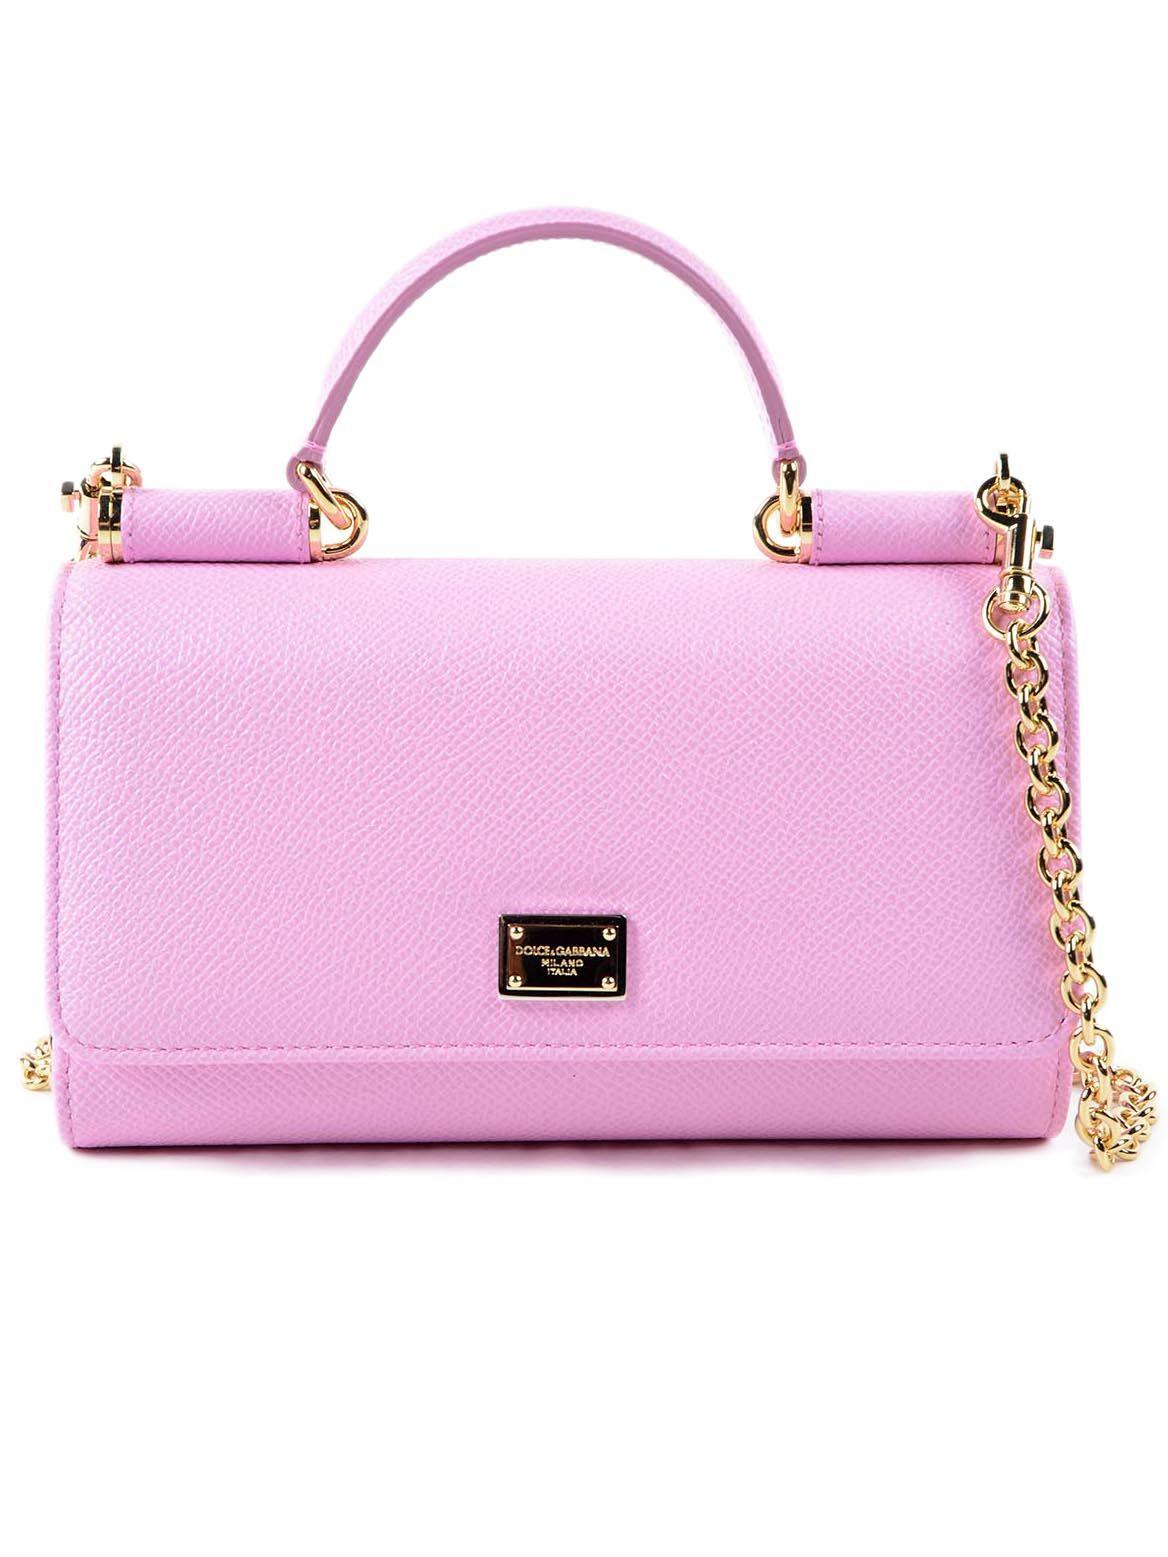 Dolce & Gabbana Dolce & Gabbana Mini Von Shoulder Bag